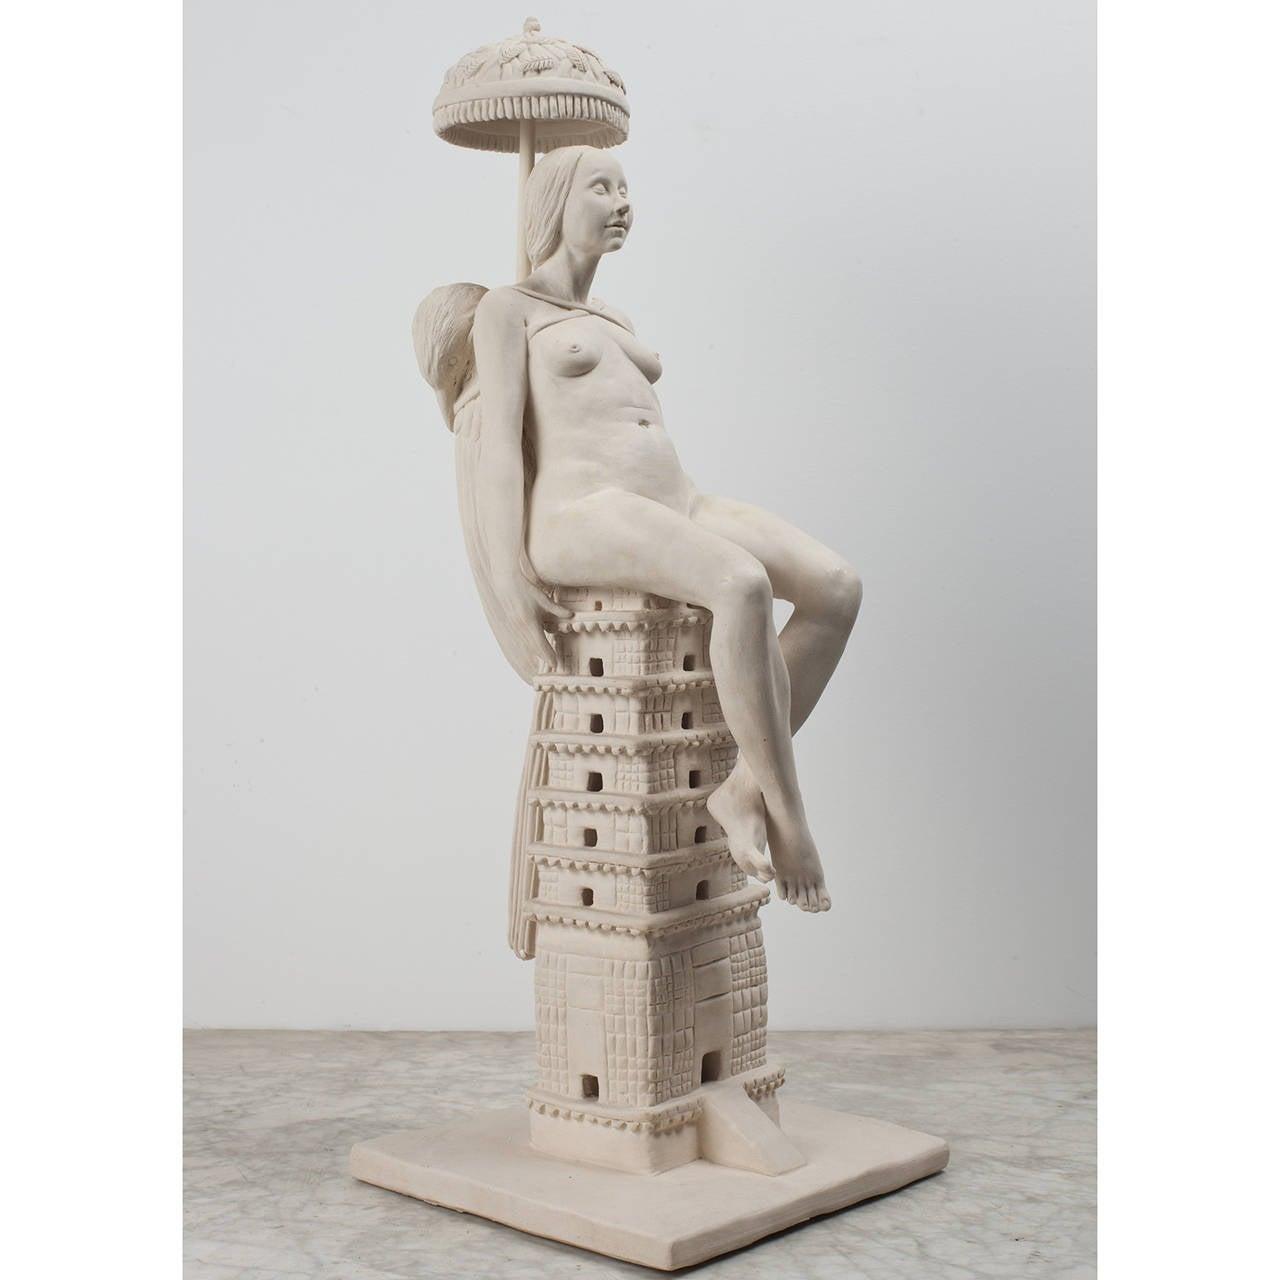 Tricia Cline Figurative Sculpture - She Bird Temple